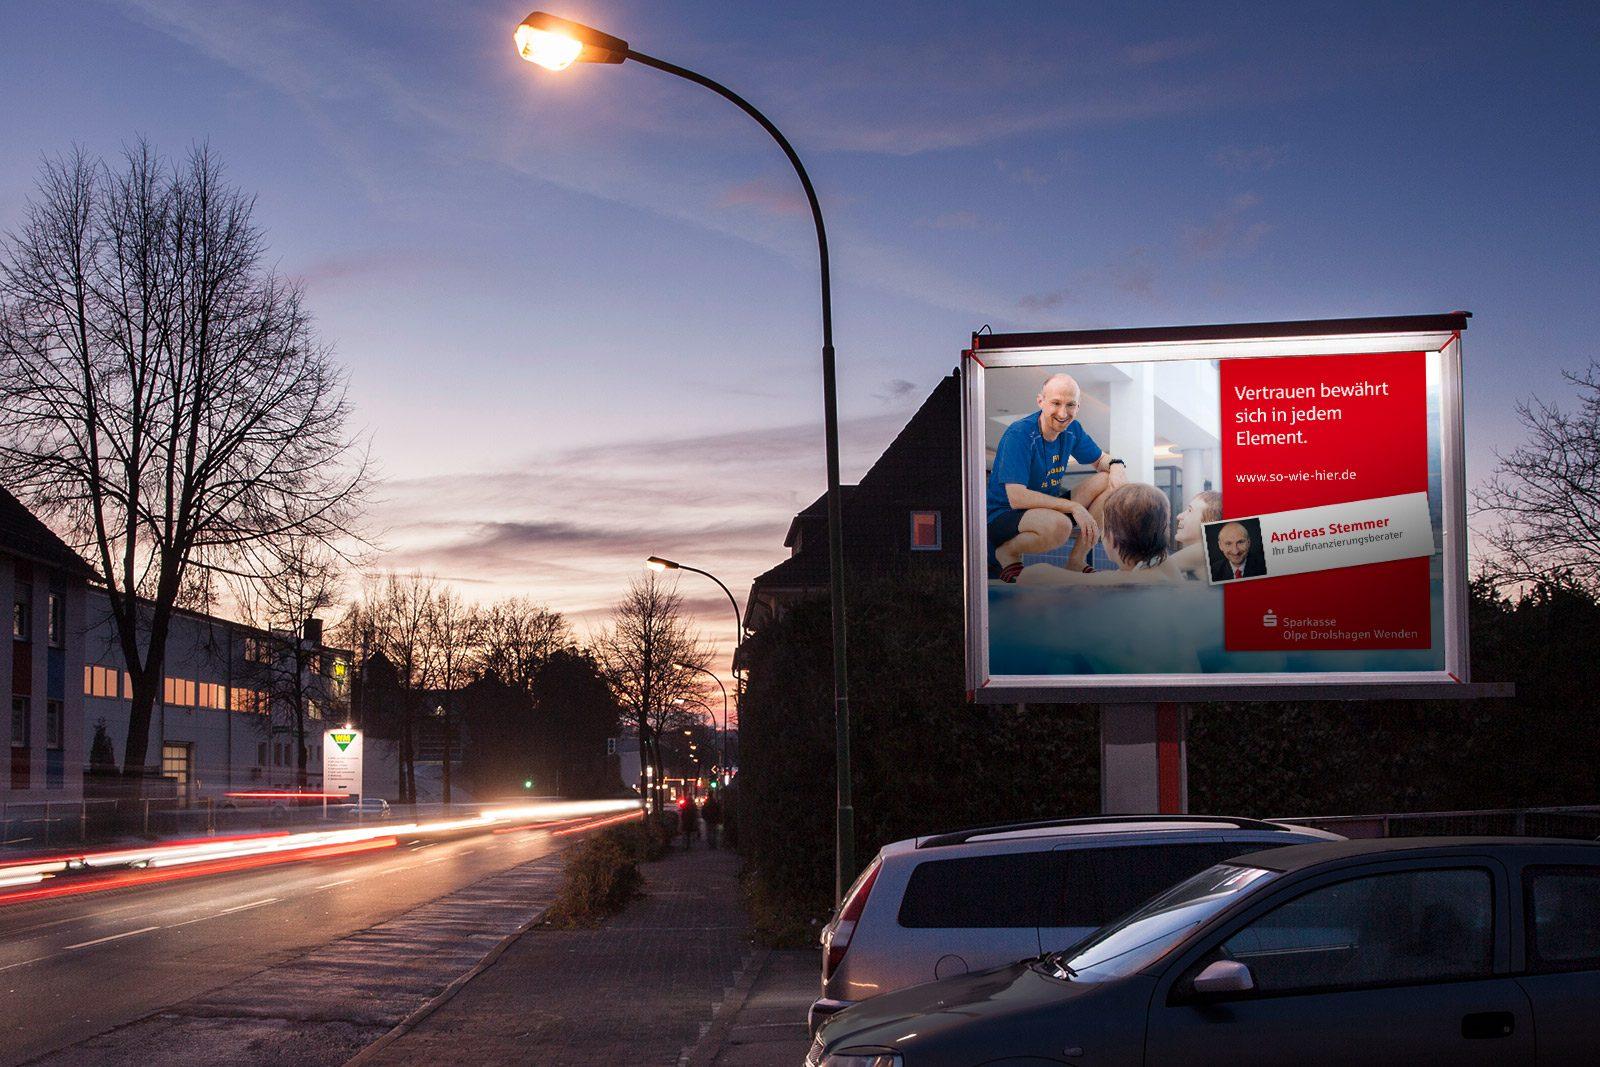 kampagne-sparkasse-olpe-drolshagen-wenden-181-02